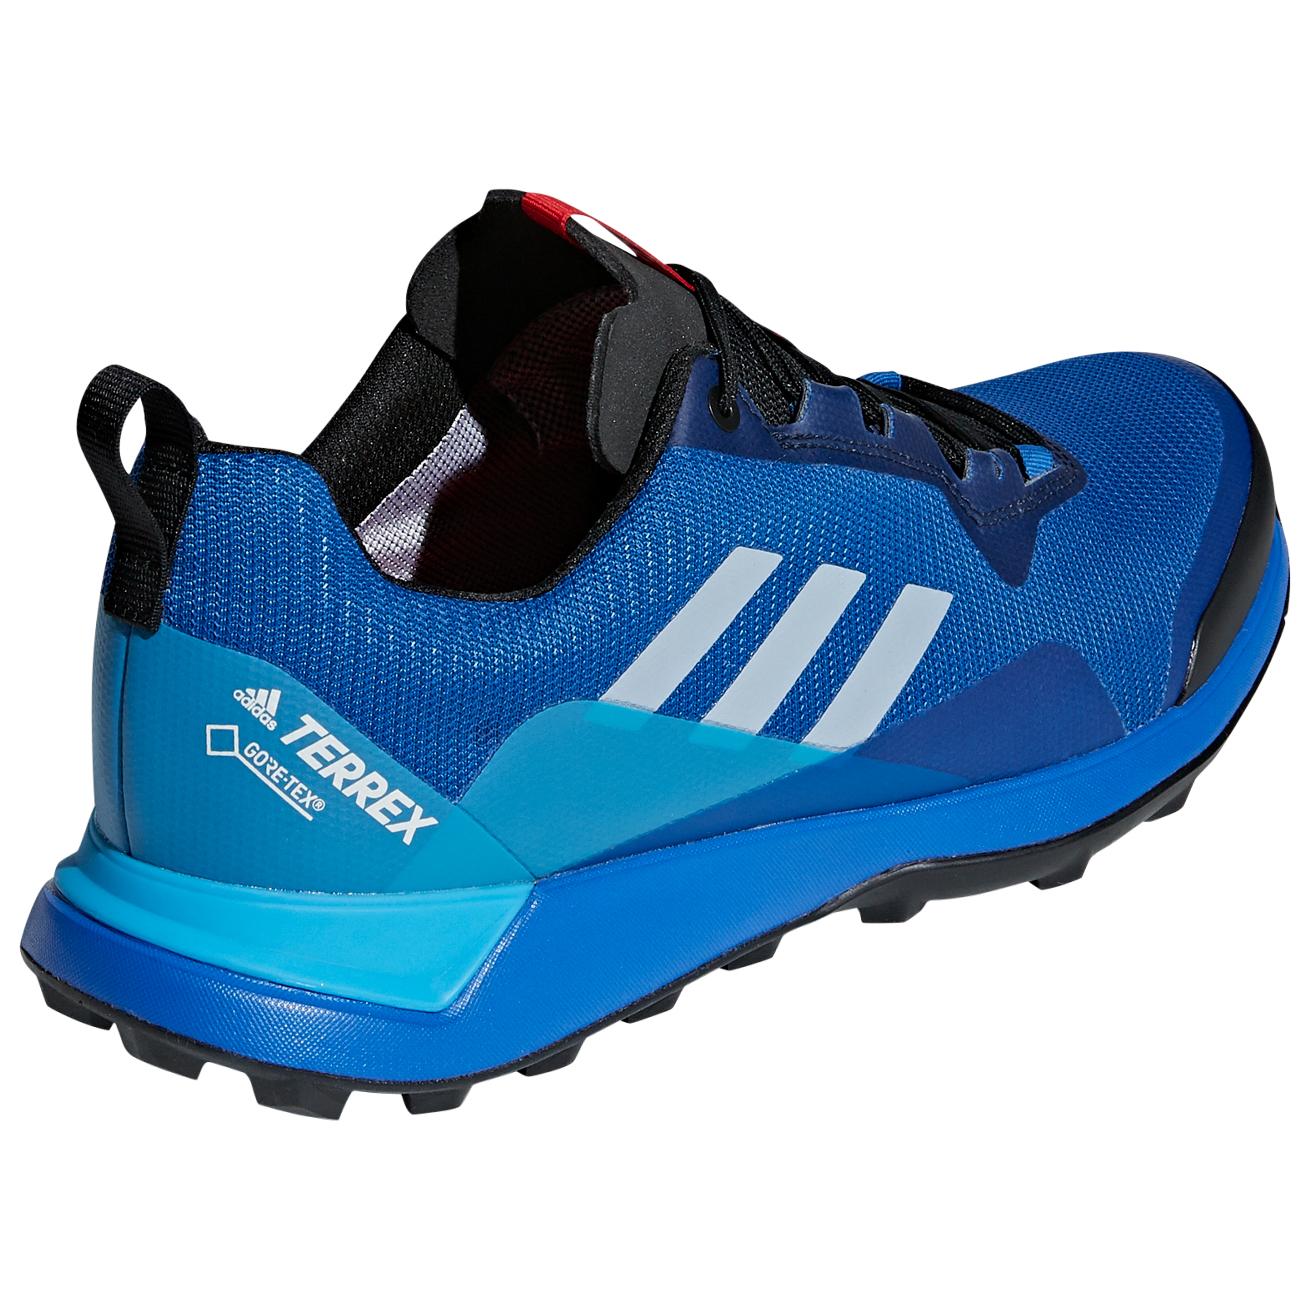 huge selection of 86cc7 eecd0 ... adidas - Terrex CMTK GTX - Chaussures de trail ...